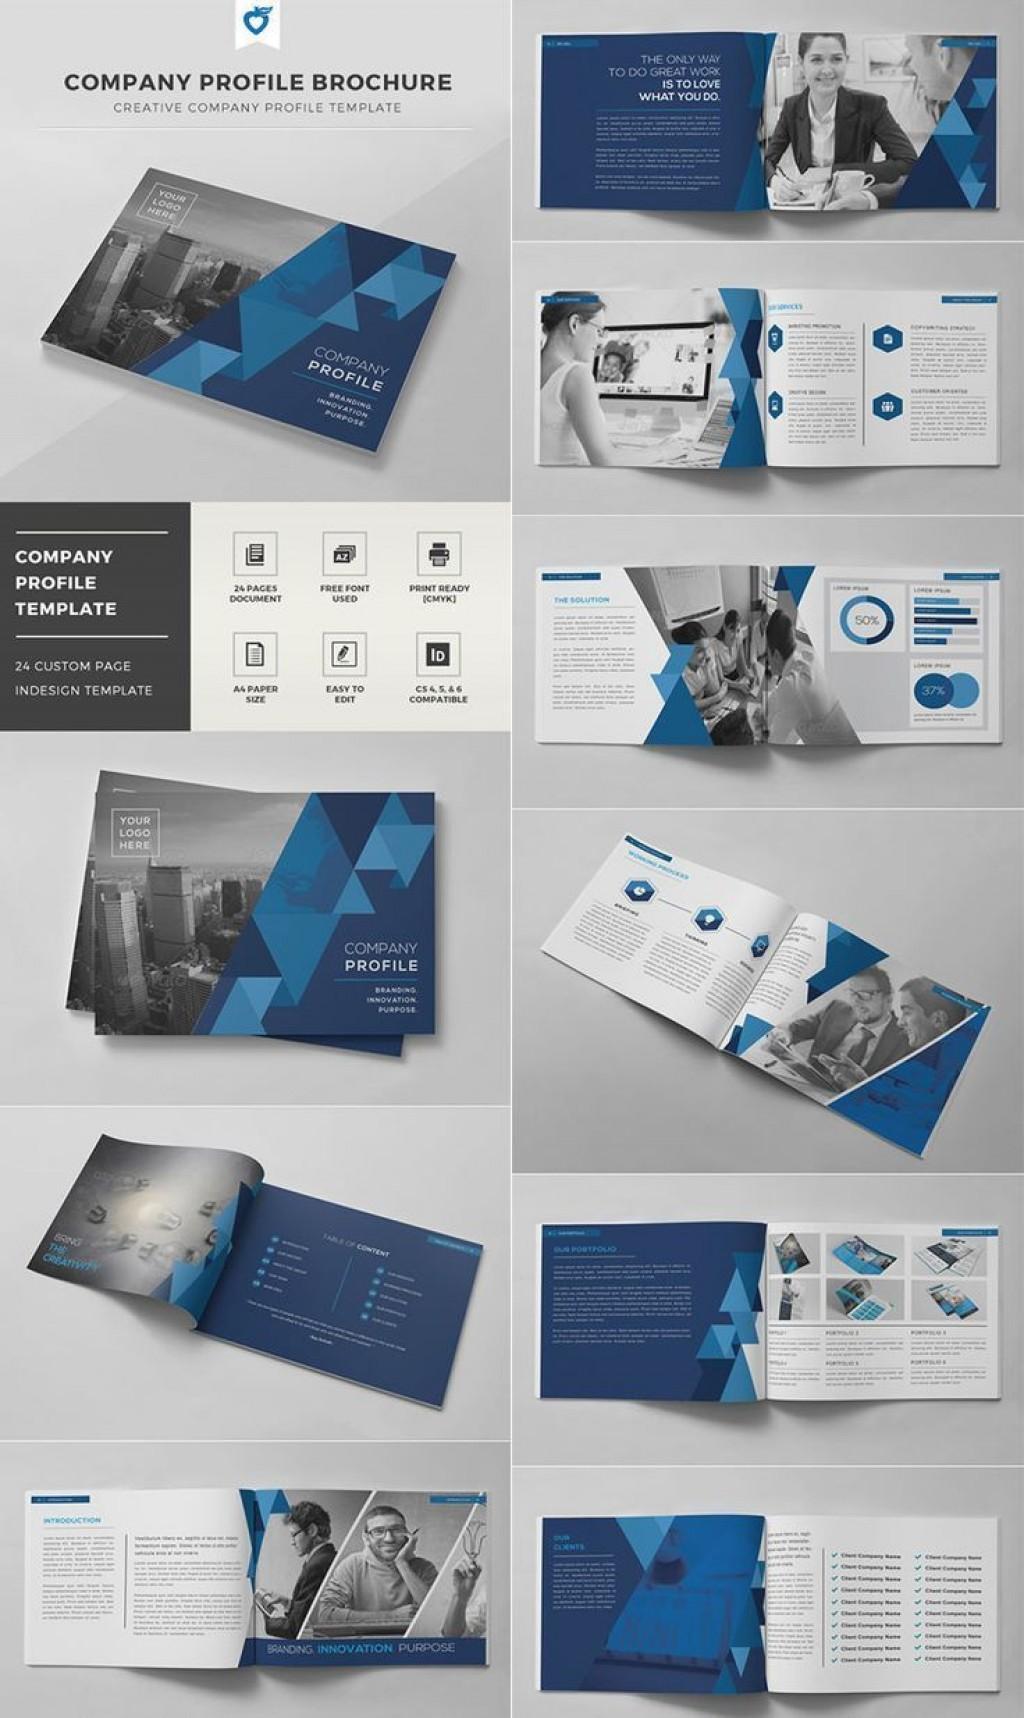 003 Astounding Busines Brochure Design Template Free Download Inspiration Large